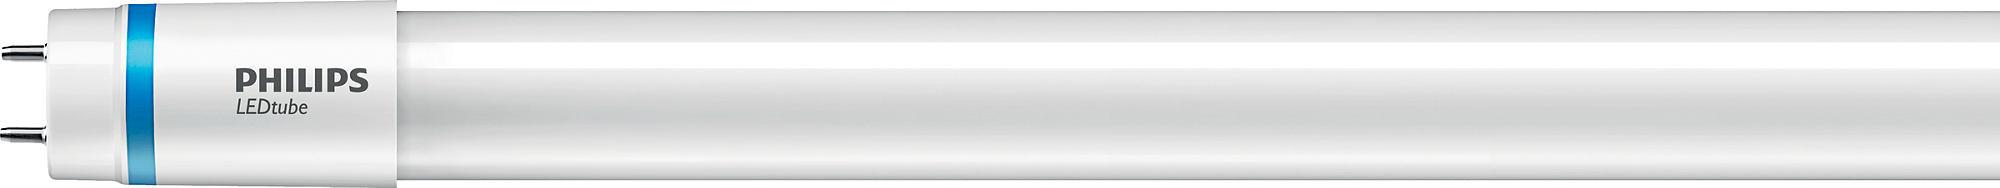 Philips MASTER LEDtube Value 1500mm 23W830 C ROT